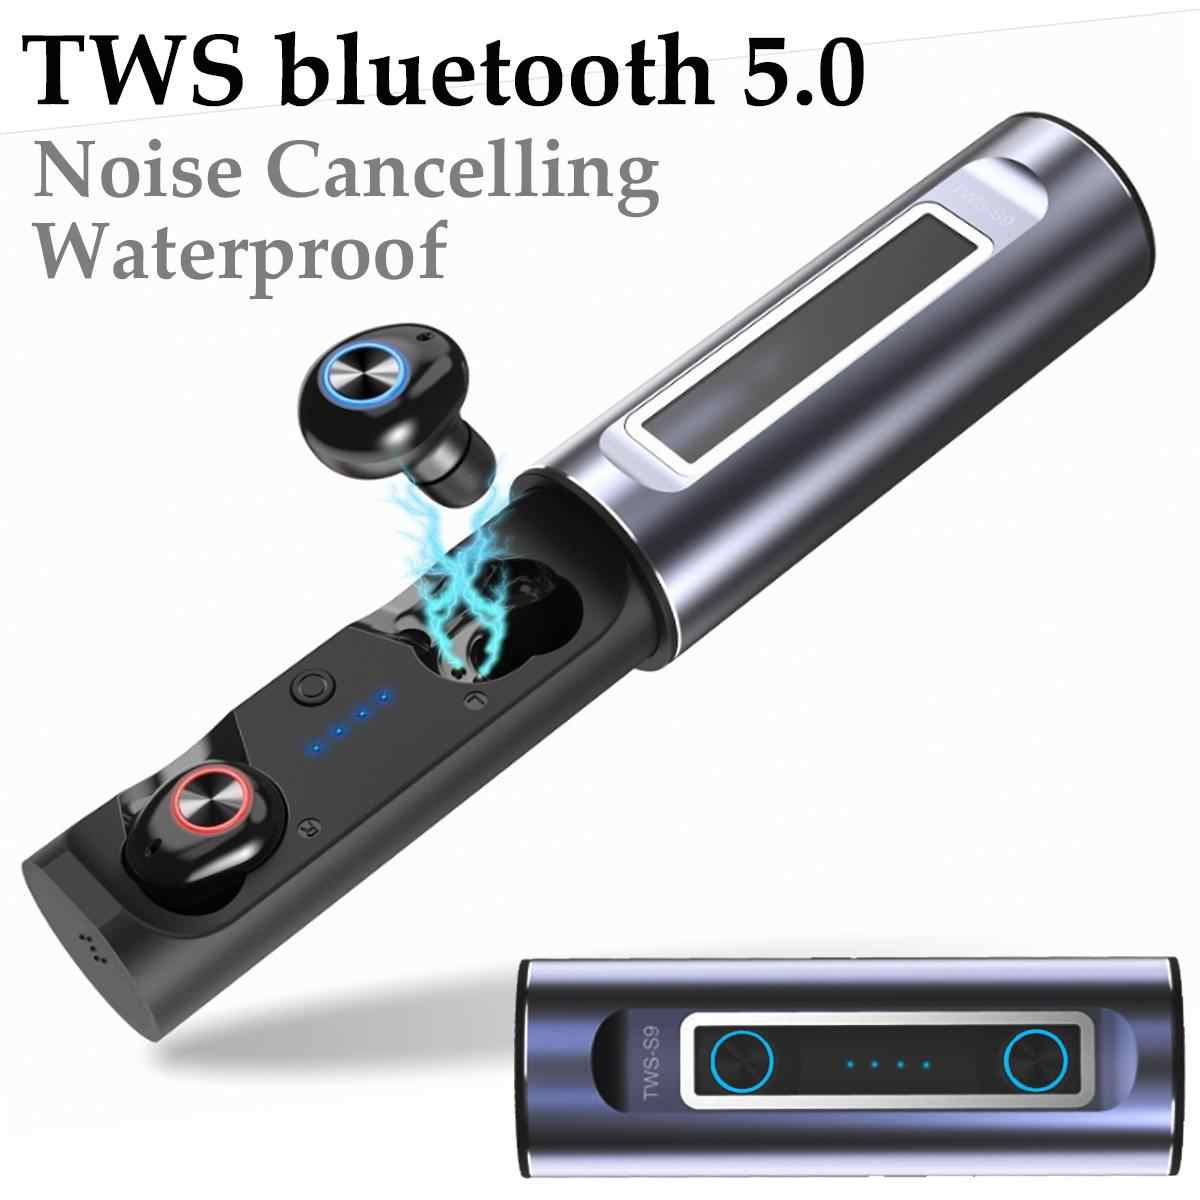 LEORY S9 真 TWS イヤホンワイヤレス bluetooth 5.0 ステレオノイズキャンセル防水二国間通話で Earbus 耳ハンズフリー